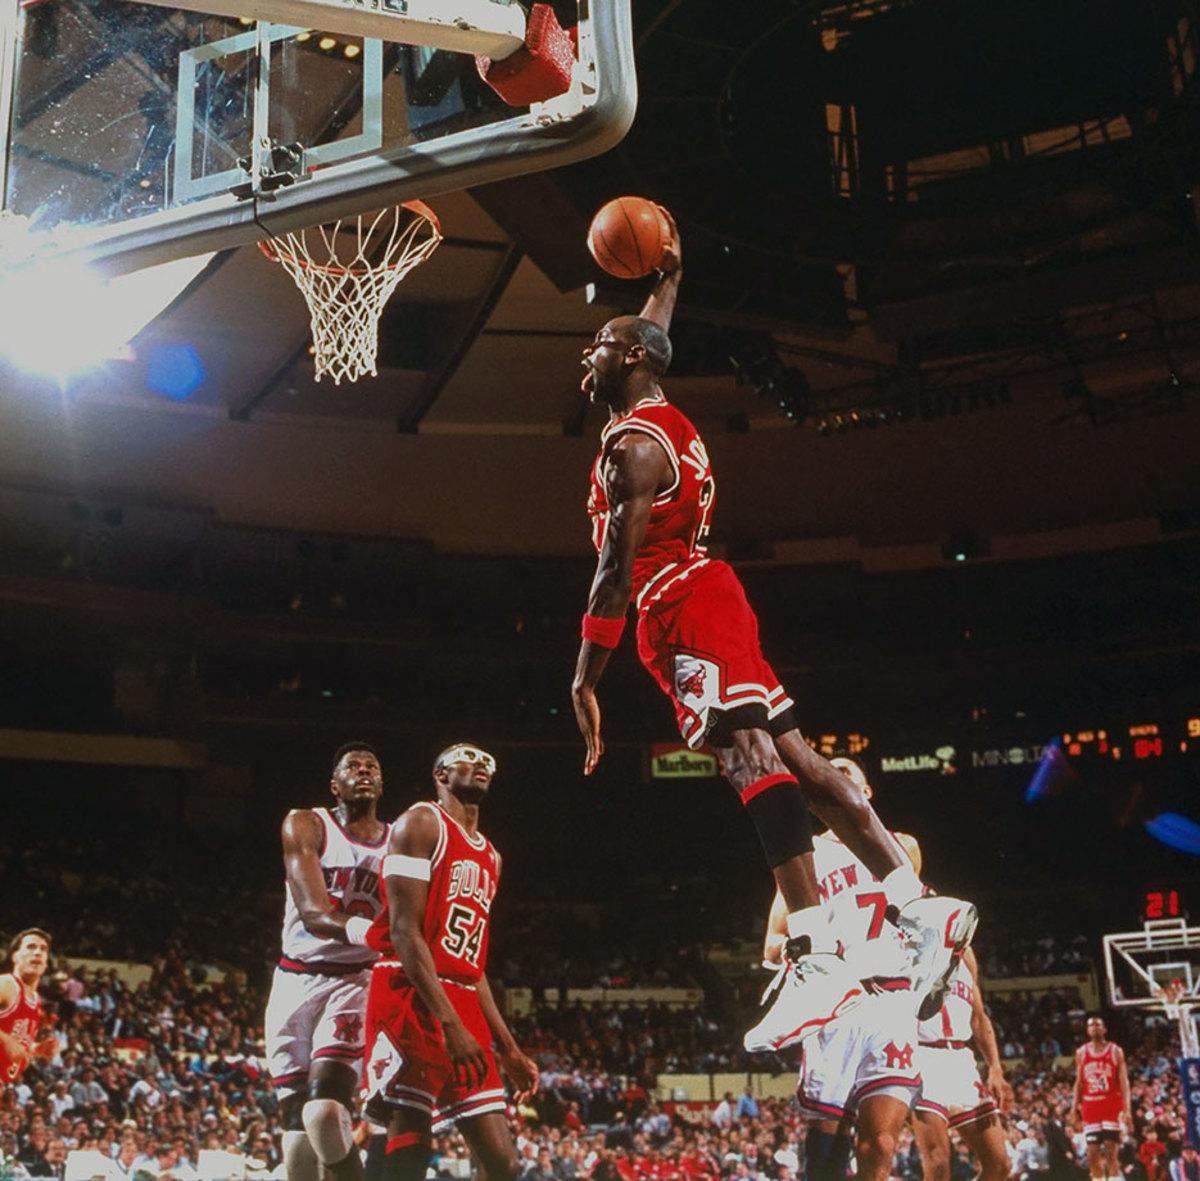 1991-0404-Michael-Jordan-05105039.jpg